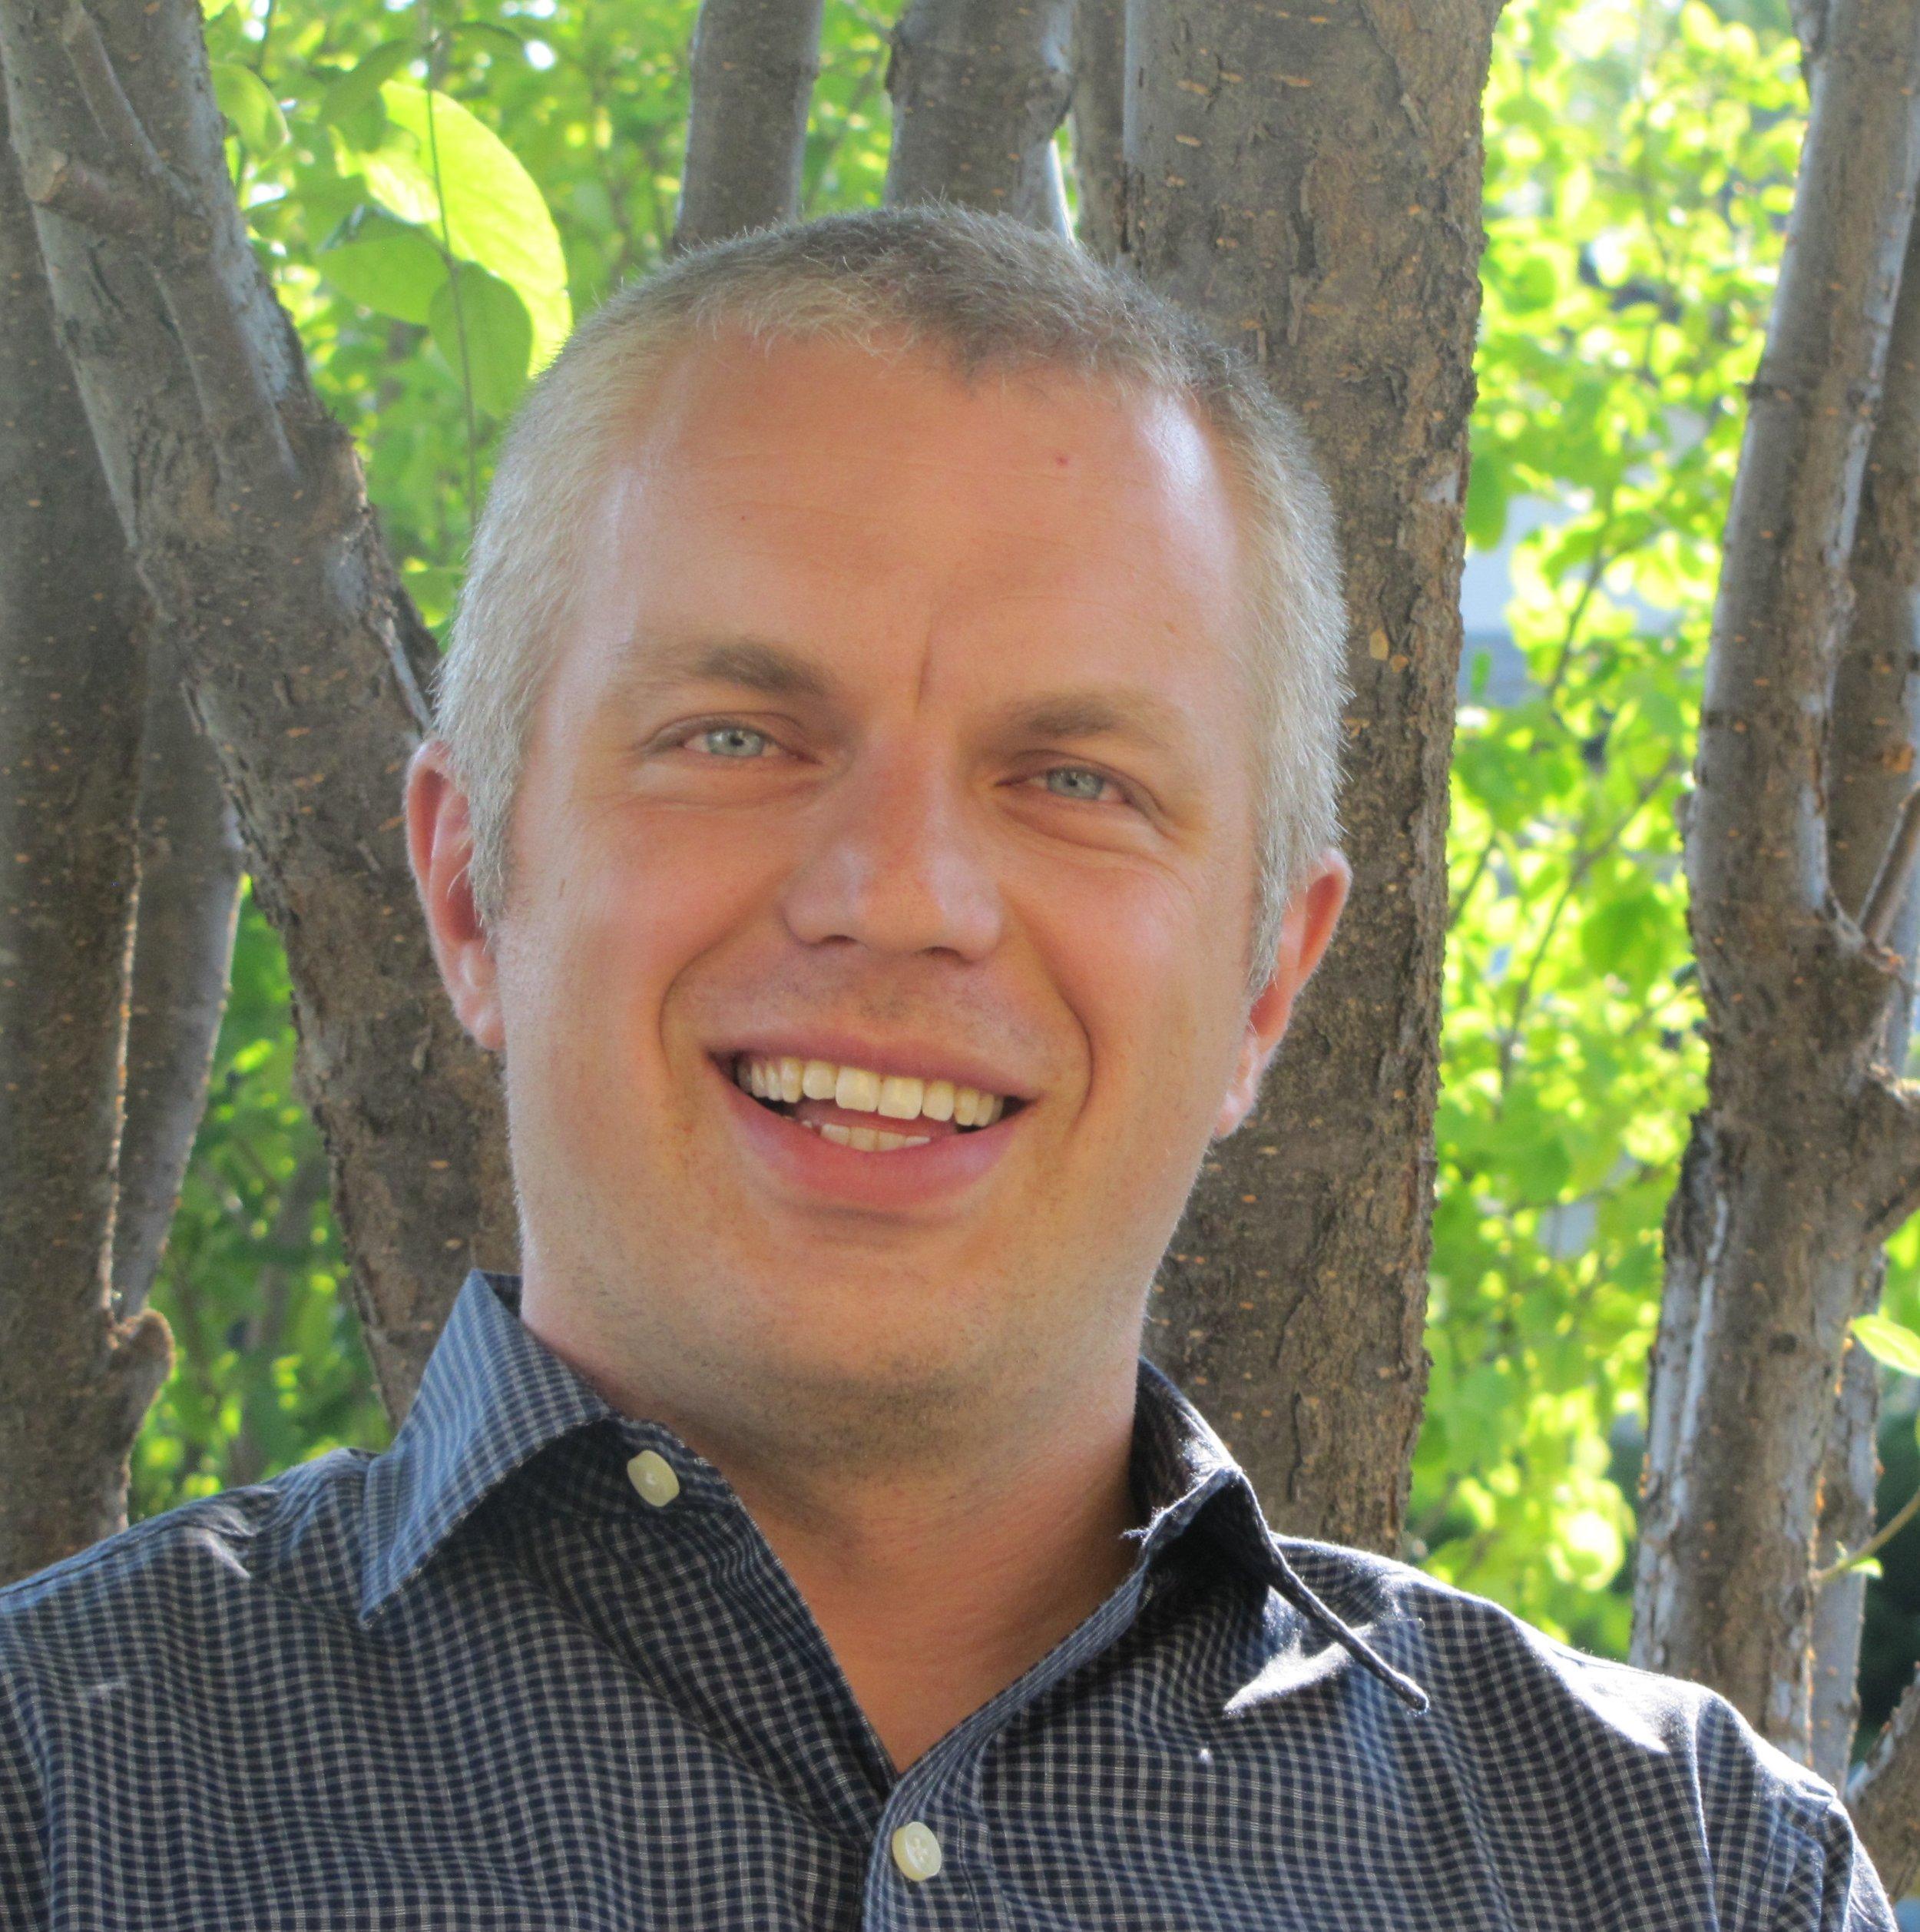 Stefan Epp-Koop